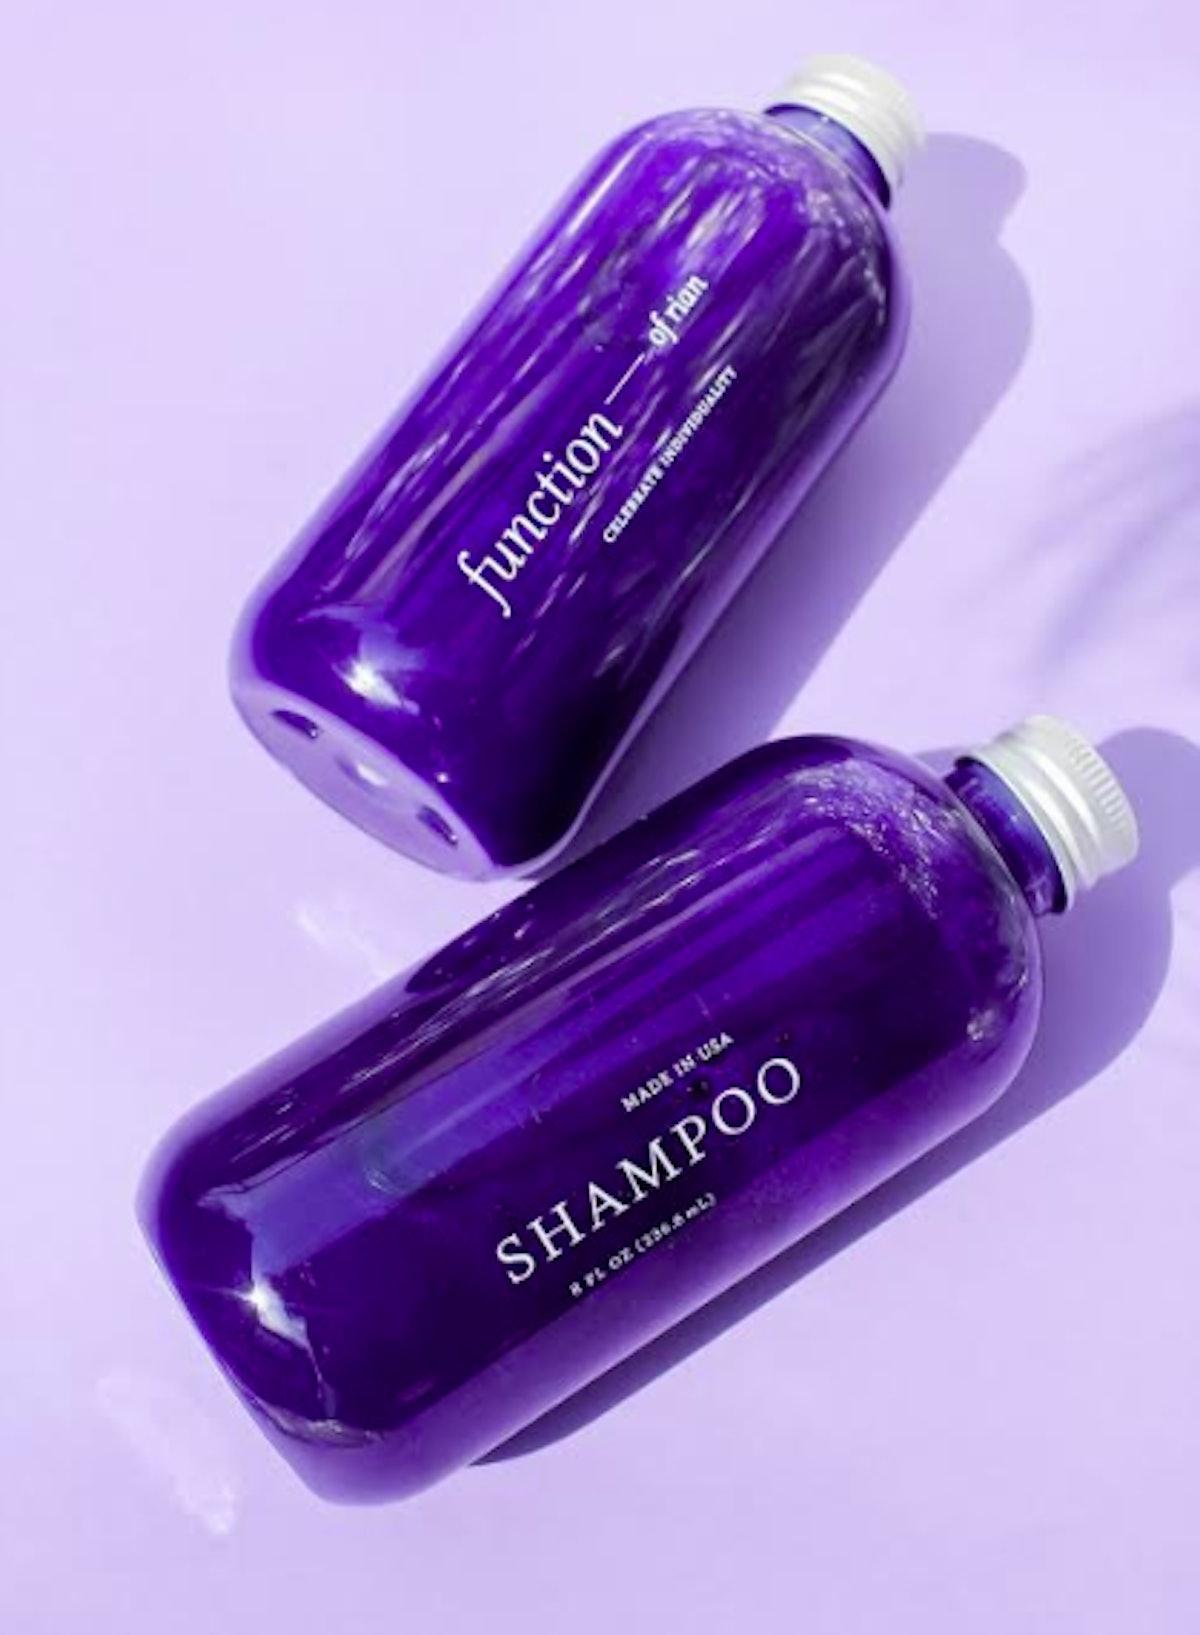 Blonde Shampoo